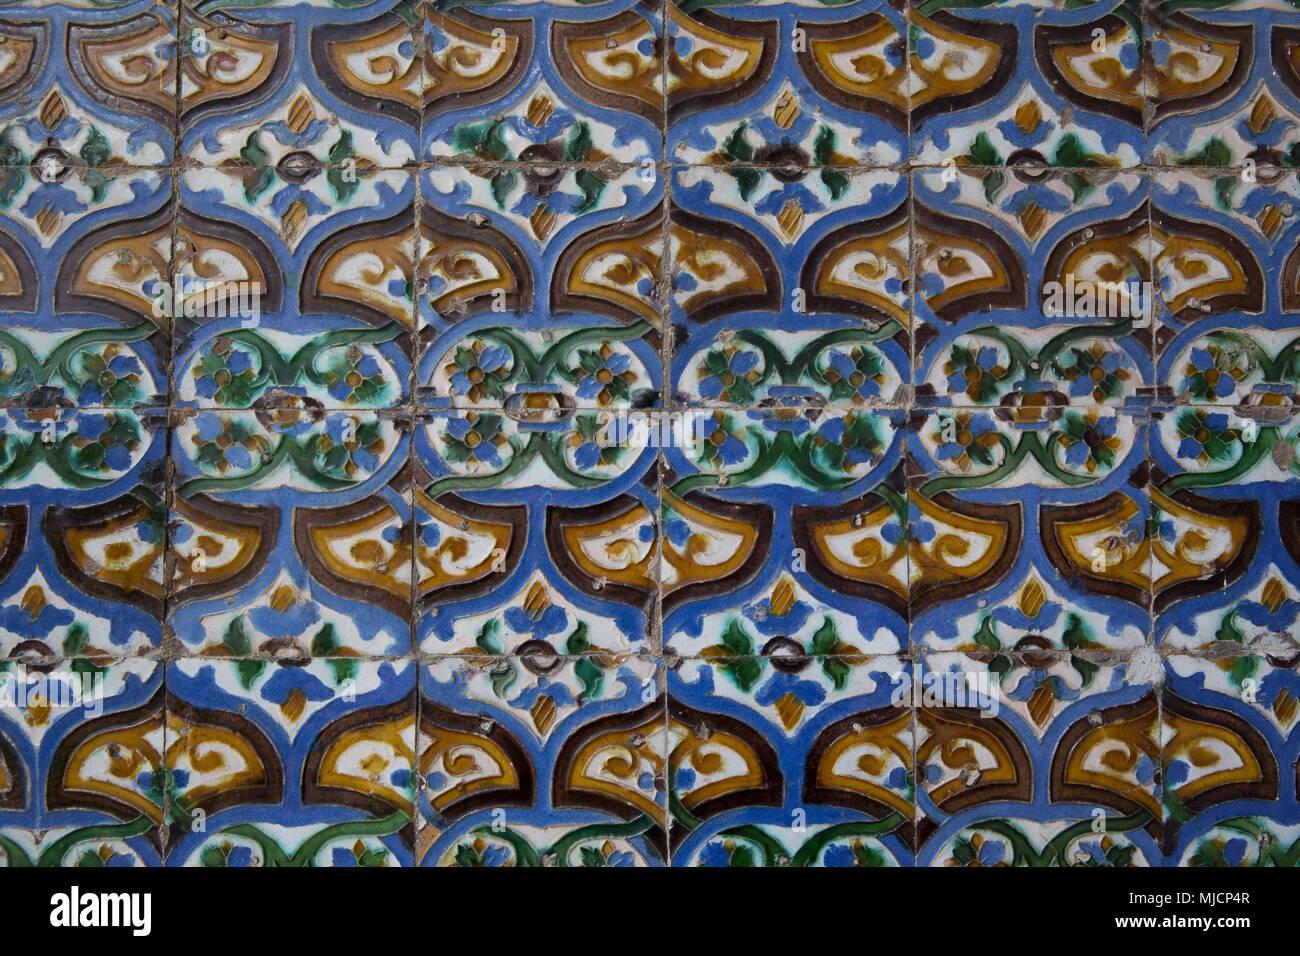 europe spain andalusia seville real alcazar antique tiles